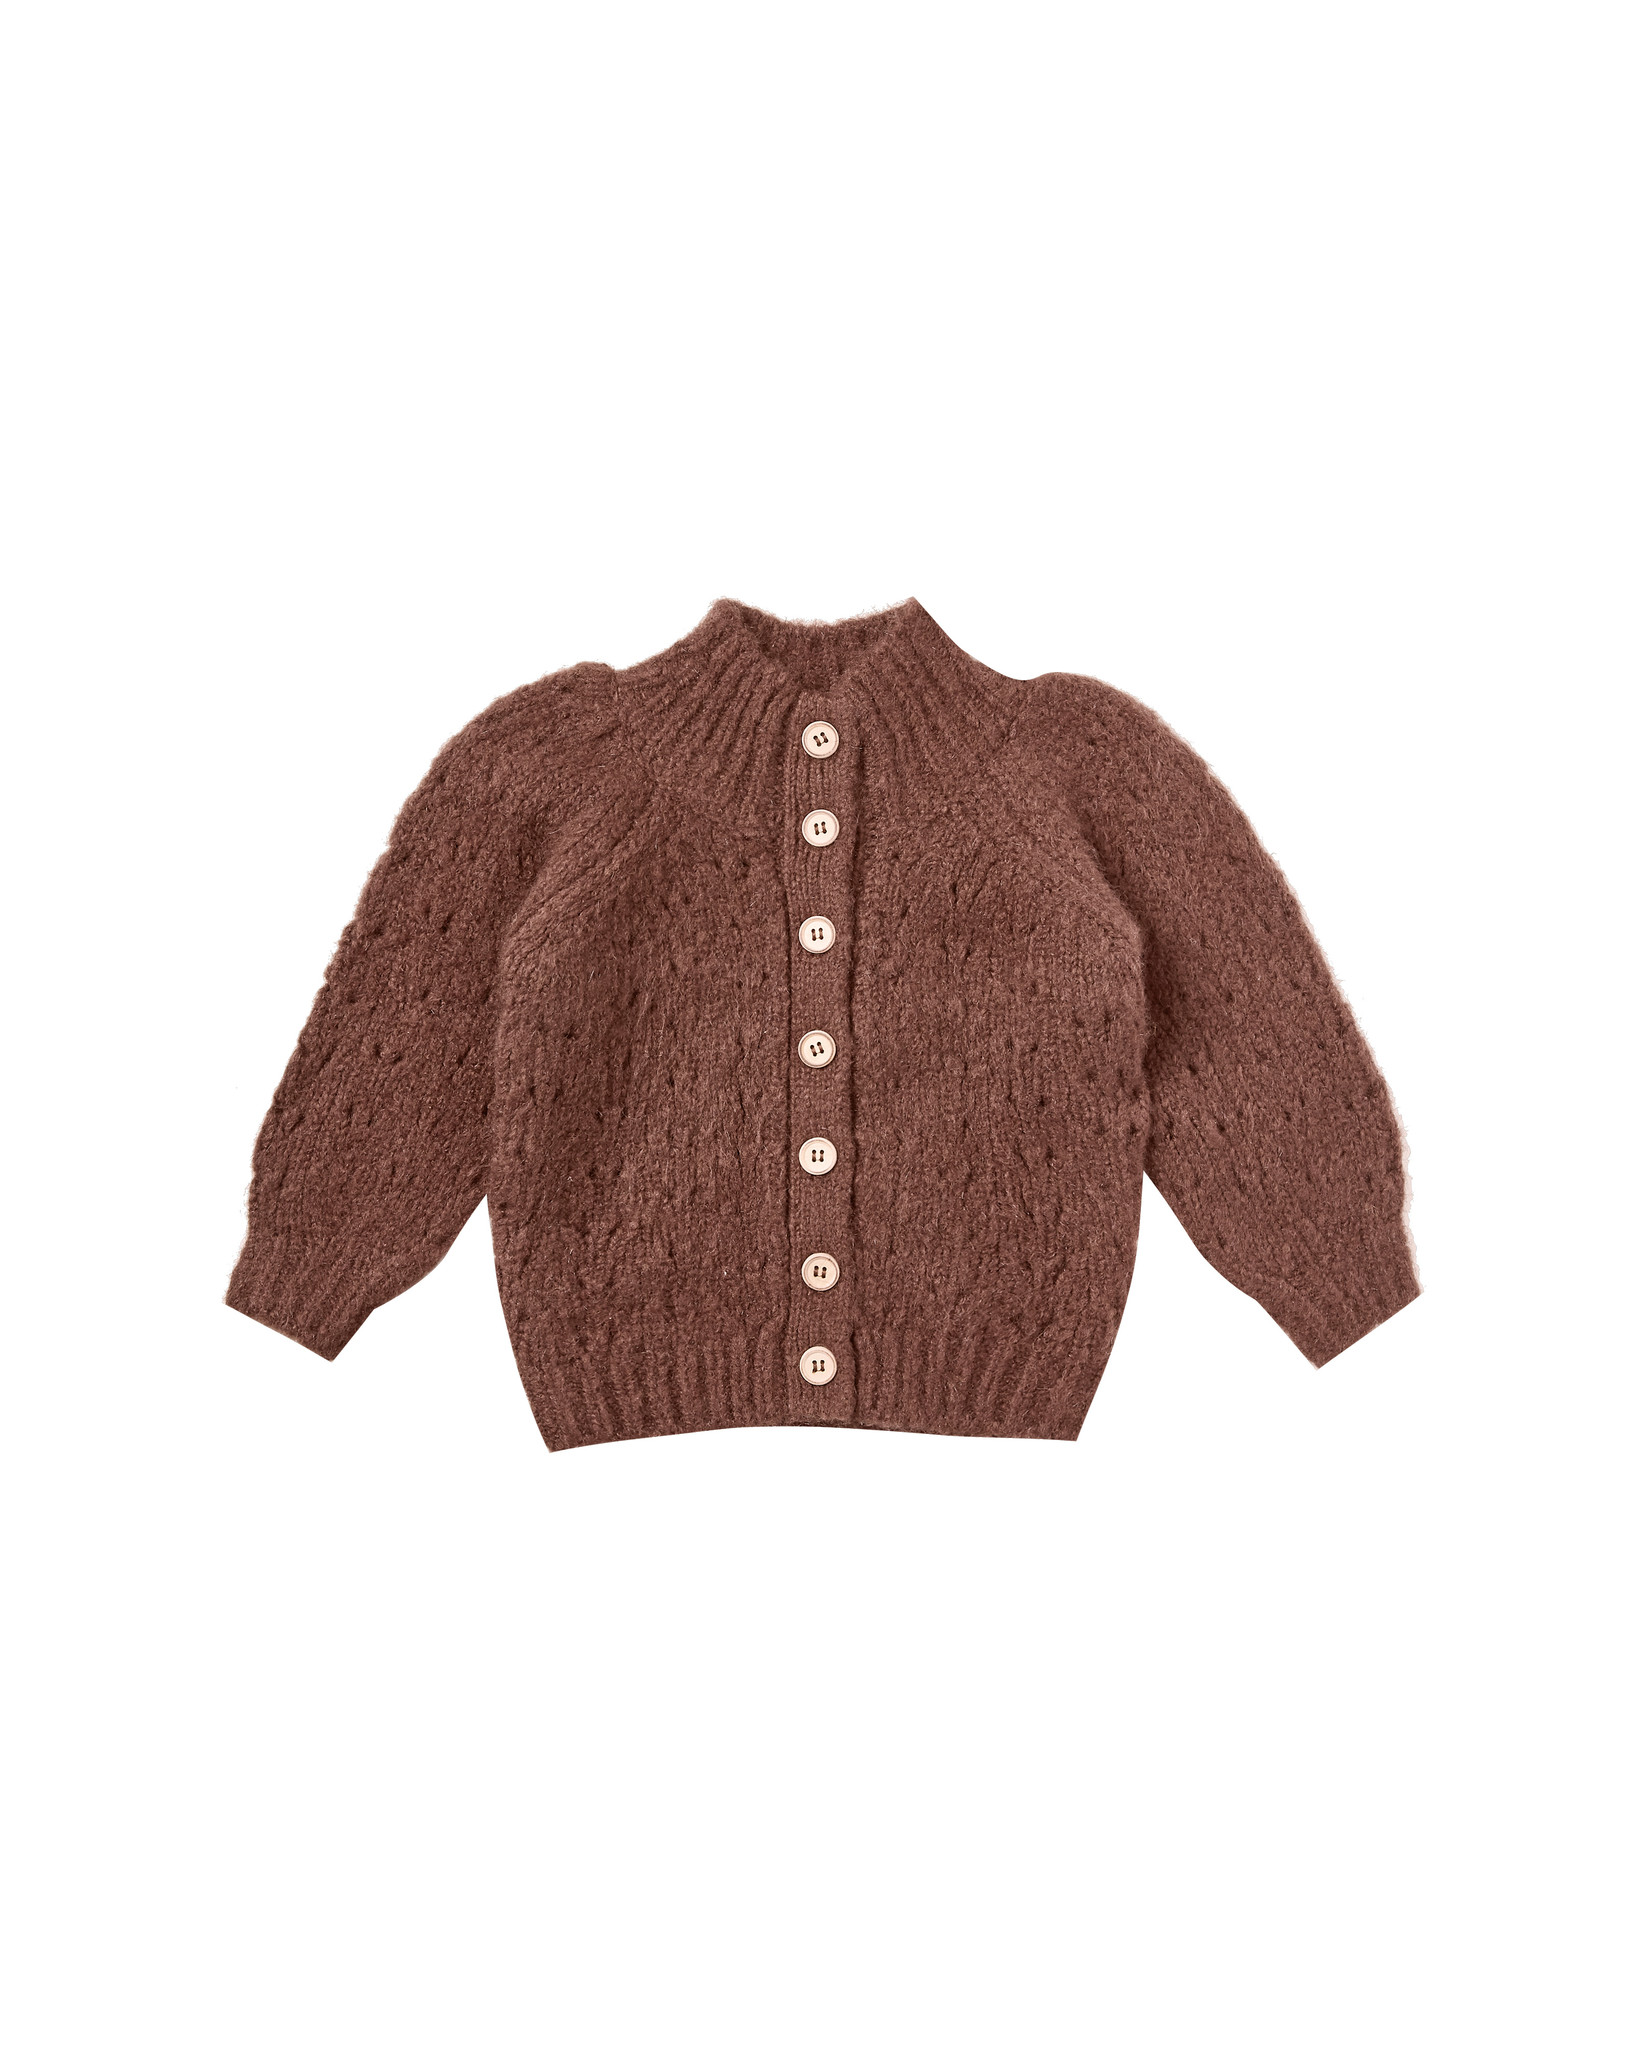 Rylee & Cru Tulip Sweater